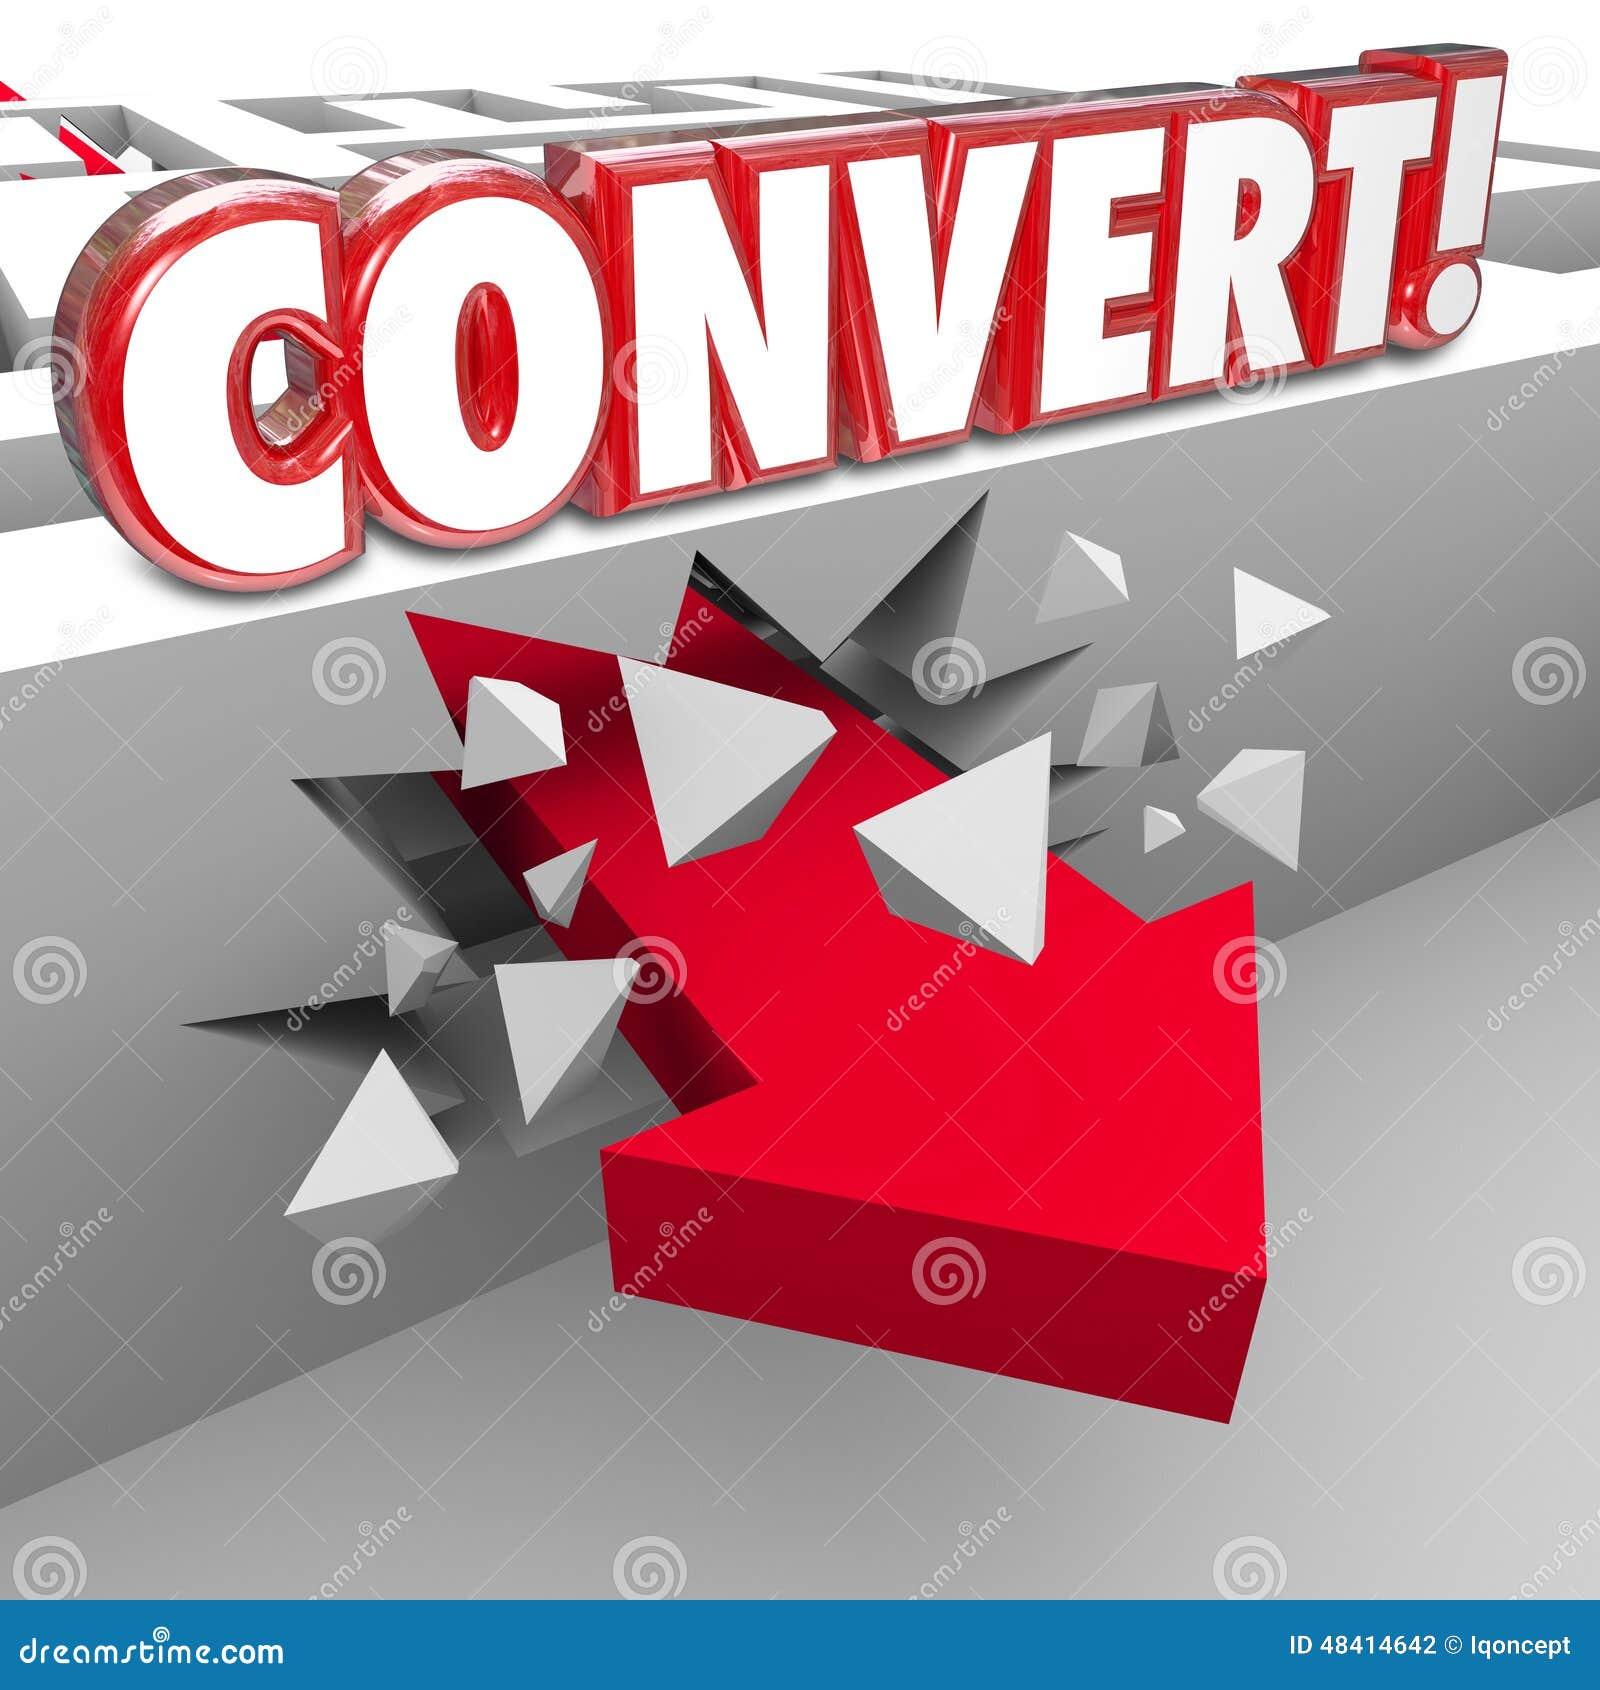 Convierta la flecha de la palabra 3d a través de Maze Selling a los clientes